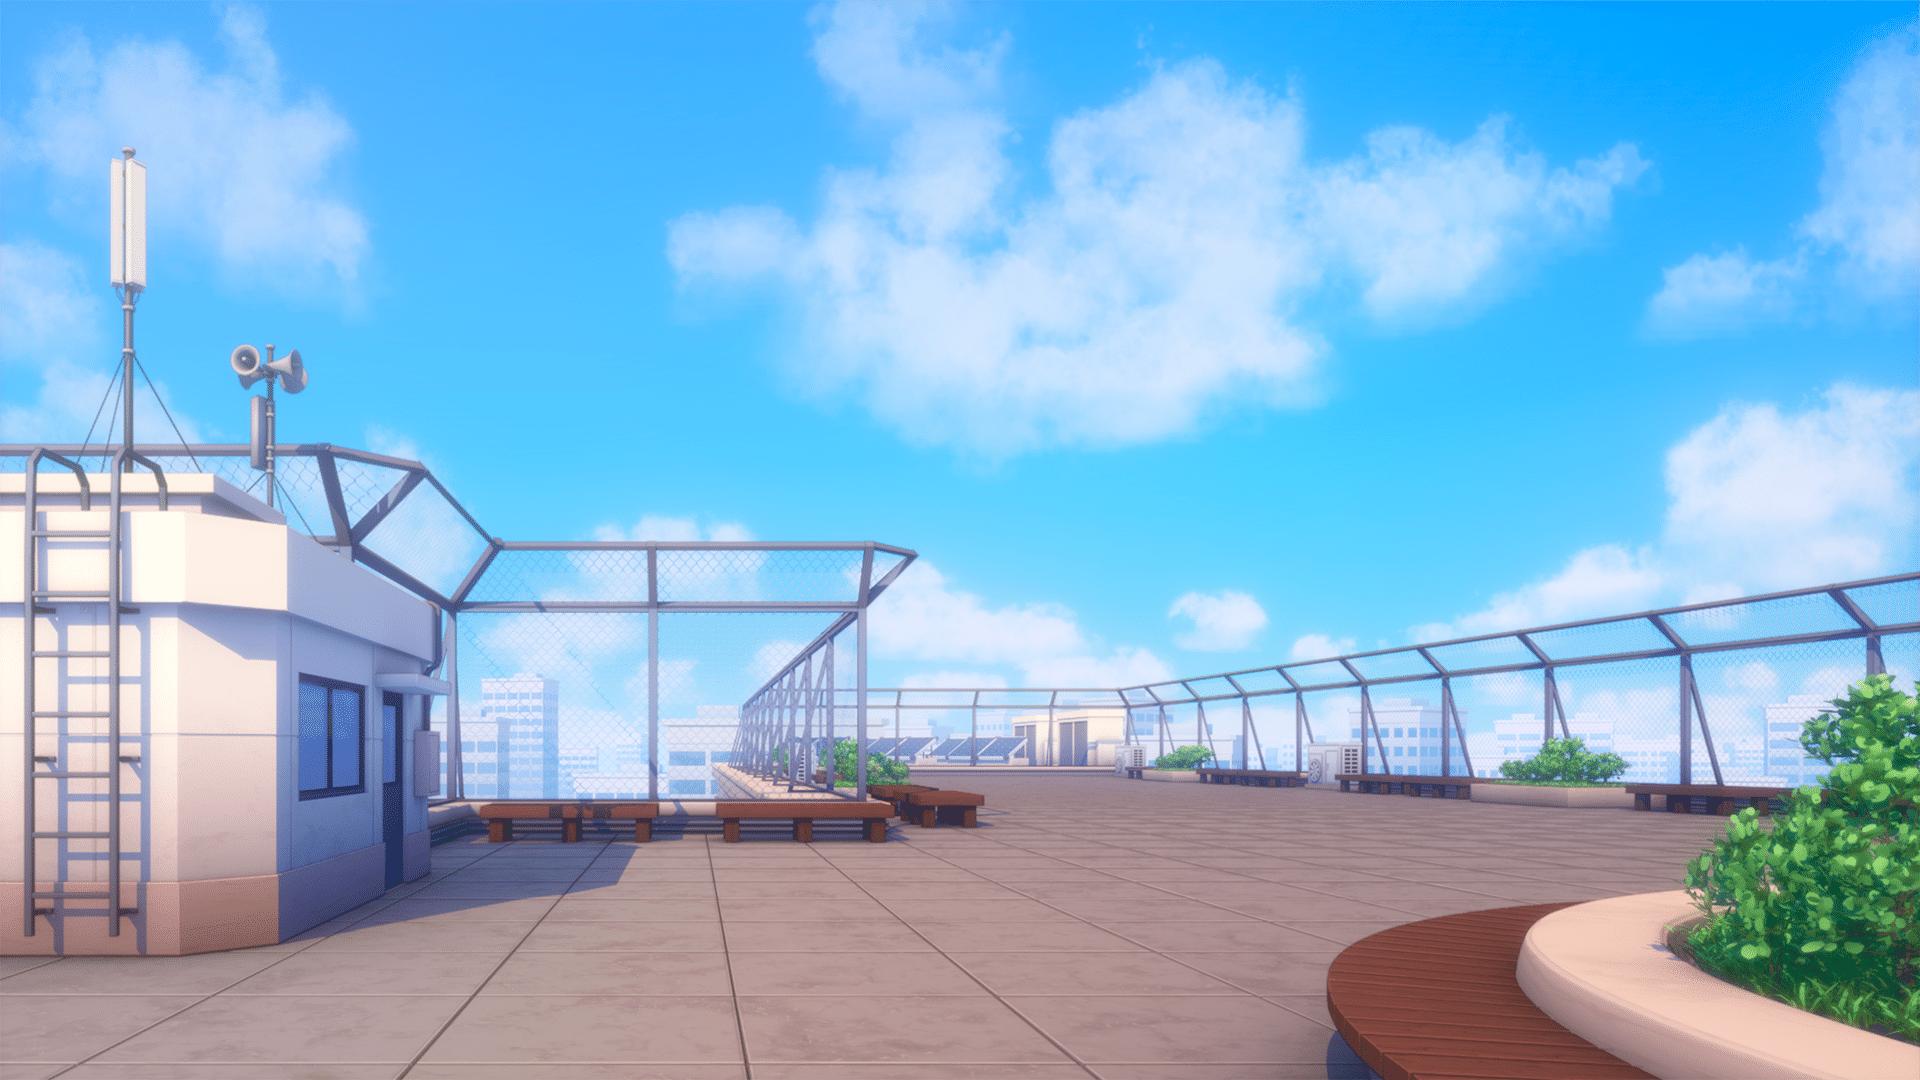 Krov Zgrade Rooftoop_ps_v01_1080p_8bit